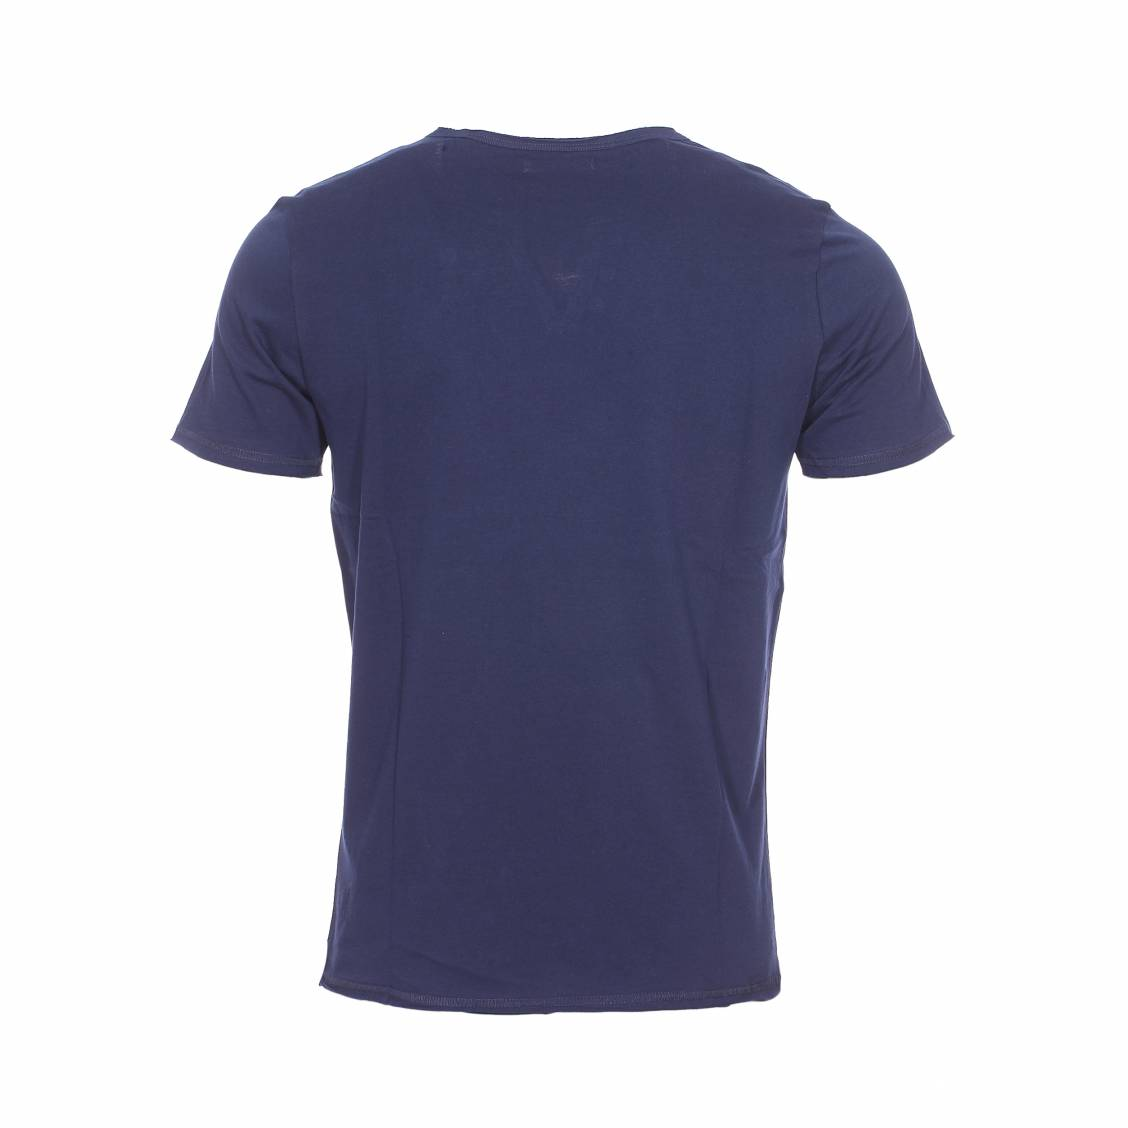 6700d95f8f573 75249-gaudi-e18-tee-shirt-811bu64030-2841-marine-tee-shirt -col-tunisien-gaudi-en-coton-bleu-marine-3 1128x1128.jpg